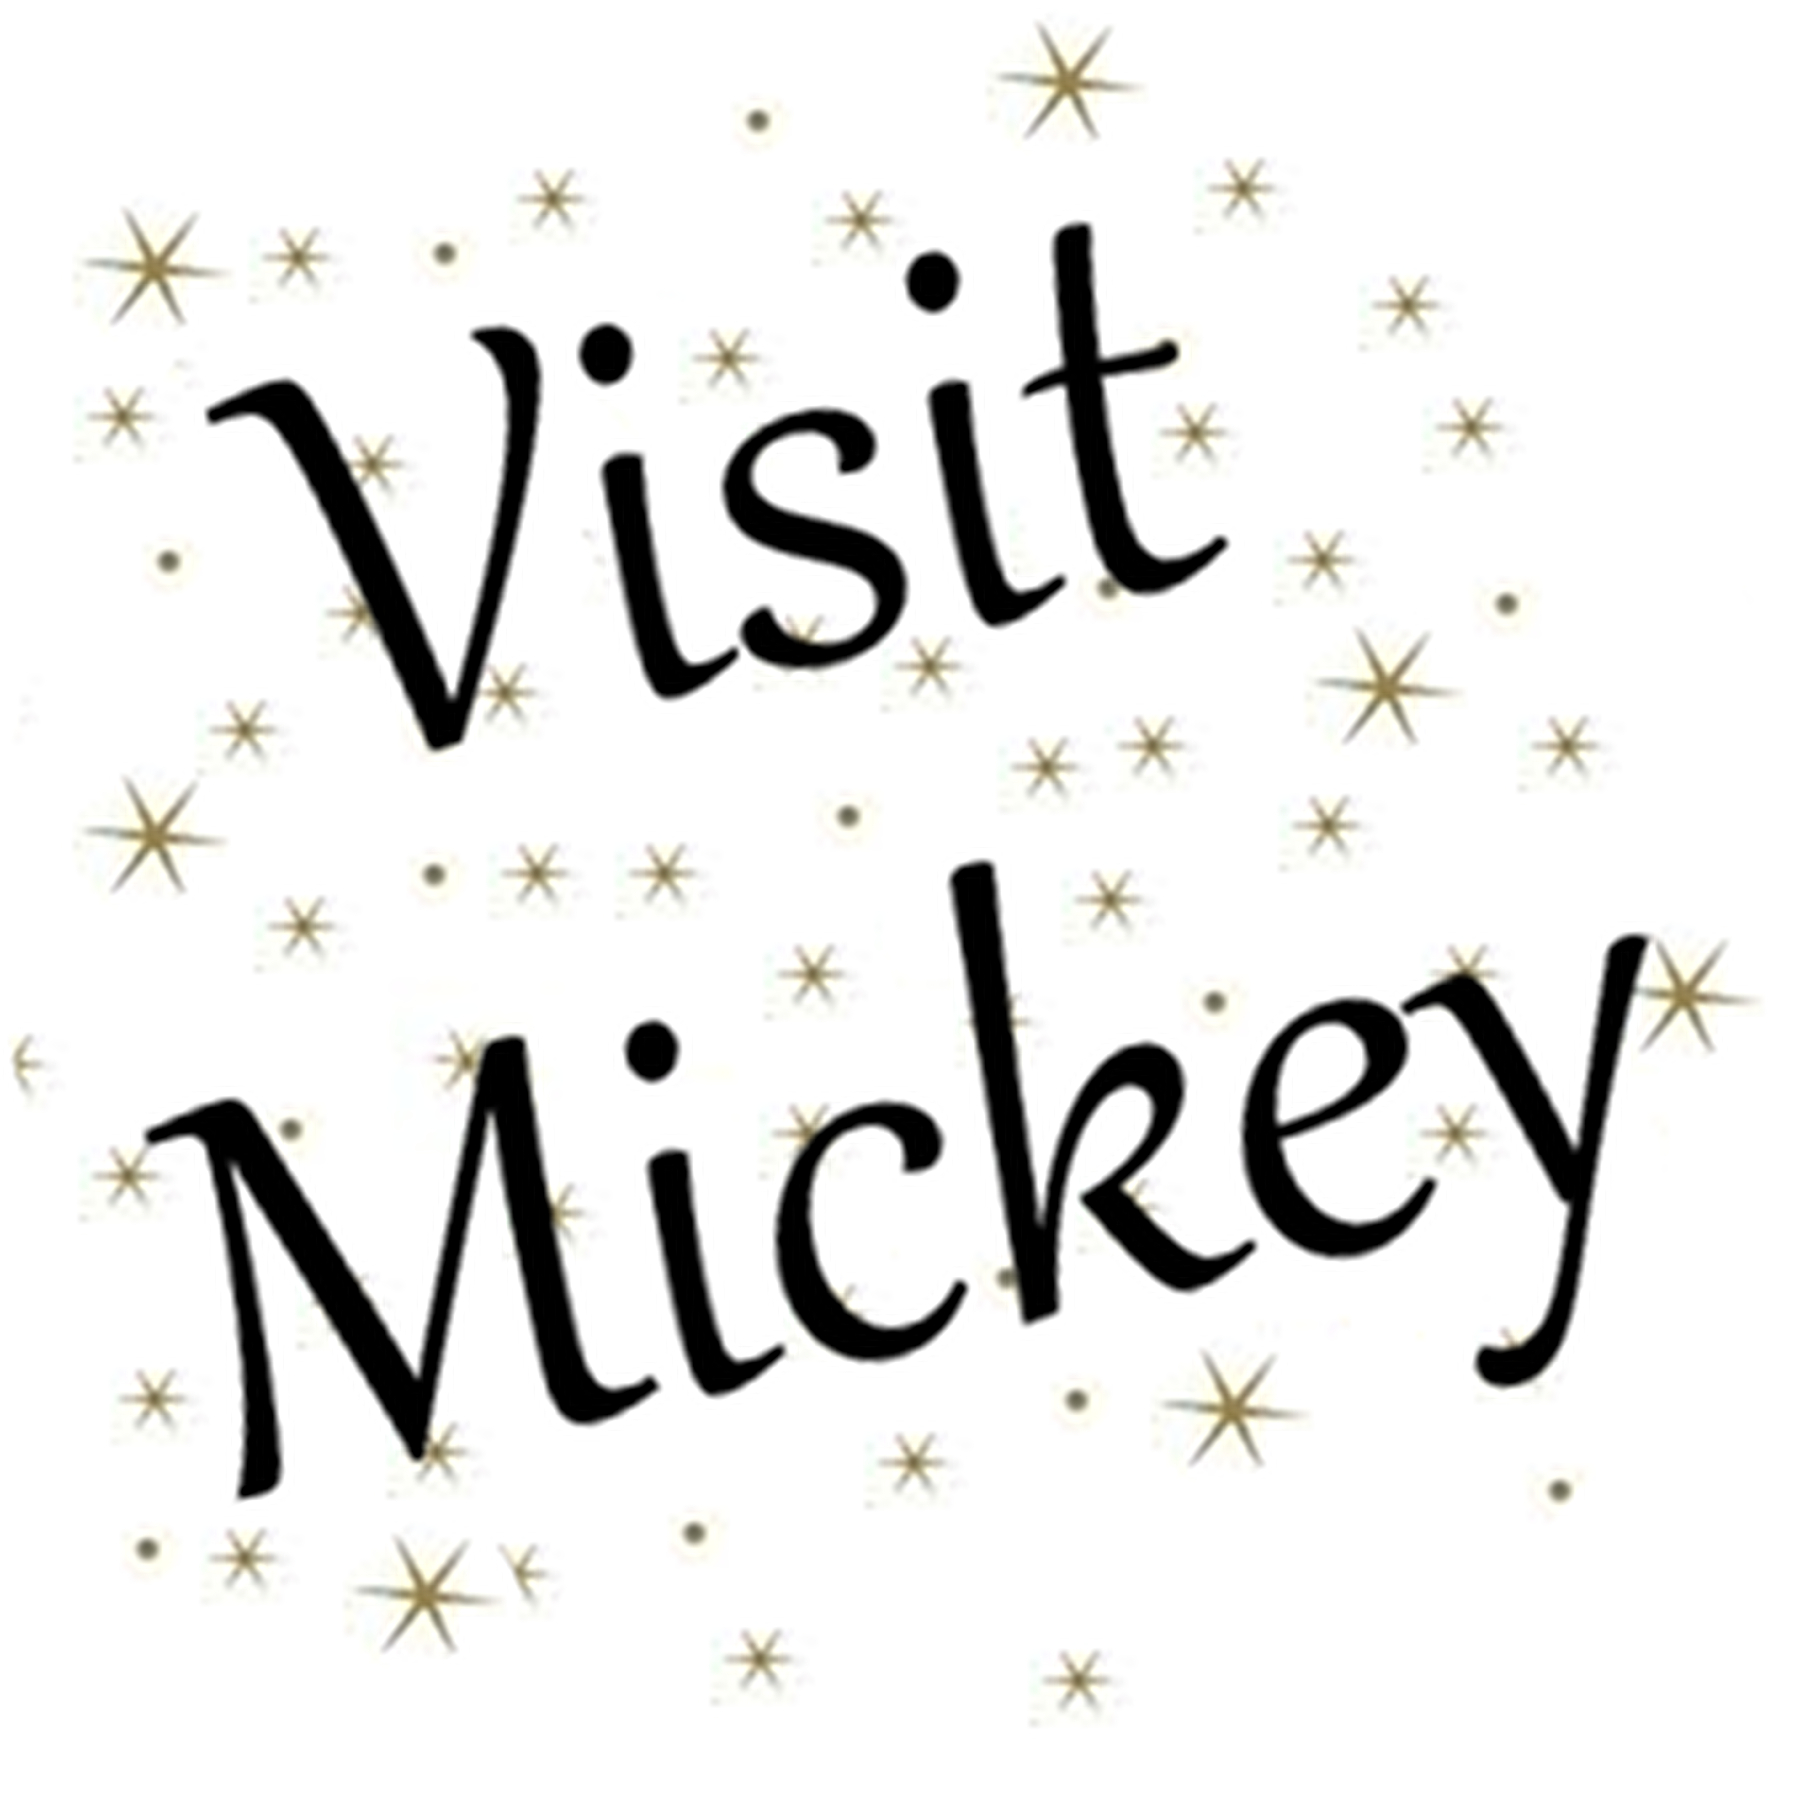 Visit Mickey